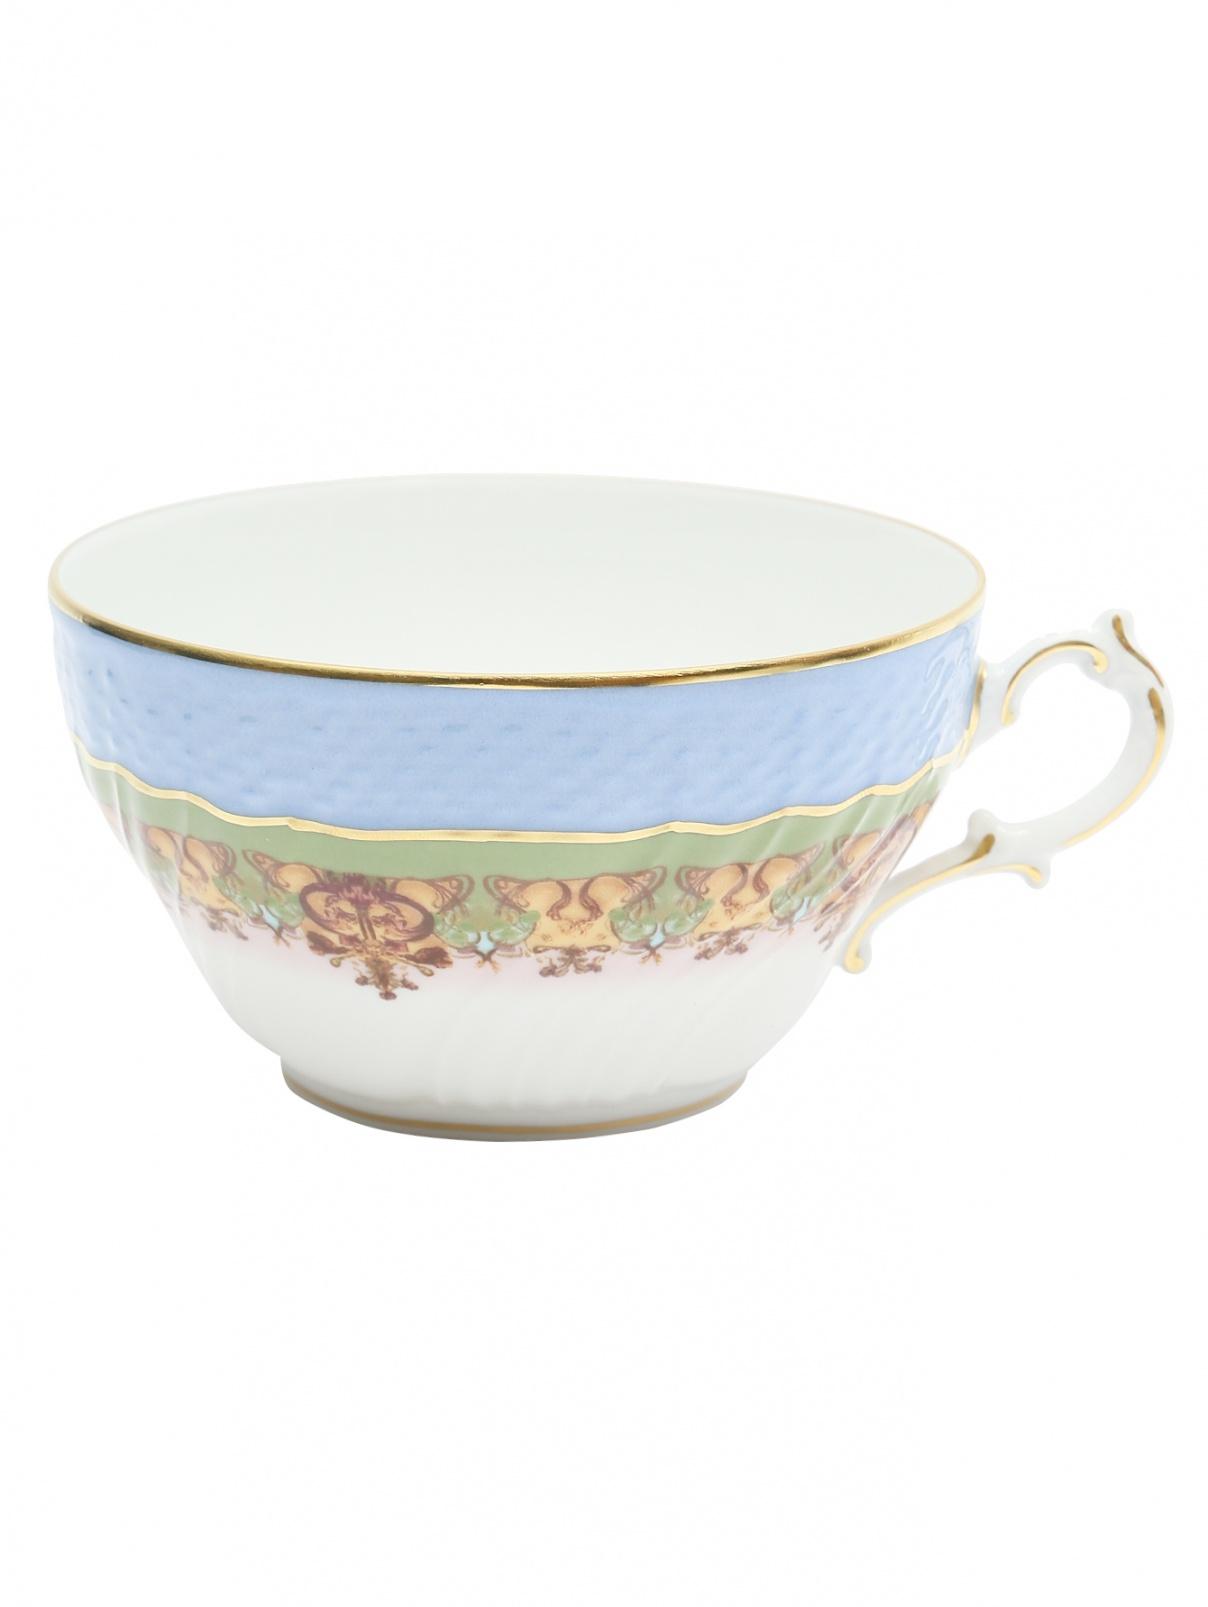 Чайная чашка 11.5 x 6 Richard Ginori 1735  –  Общий вид